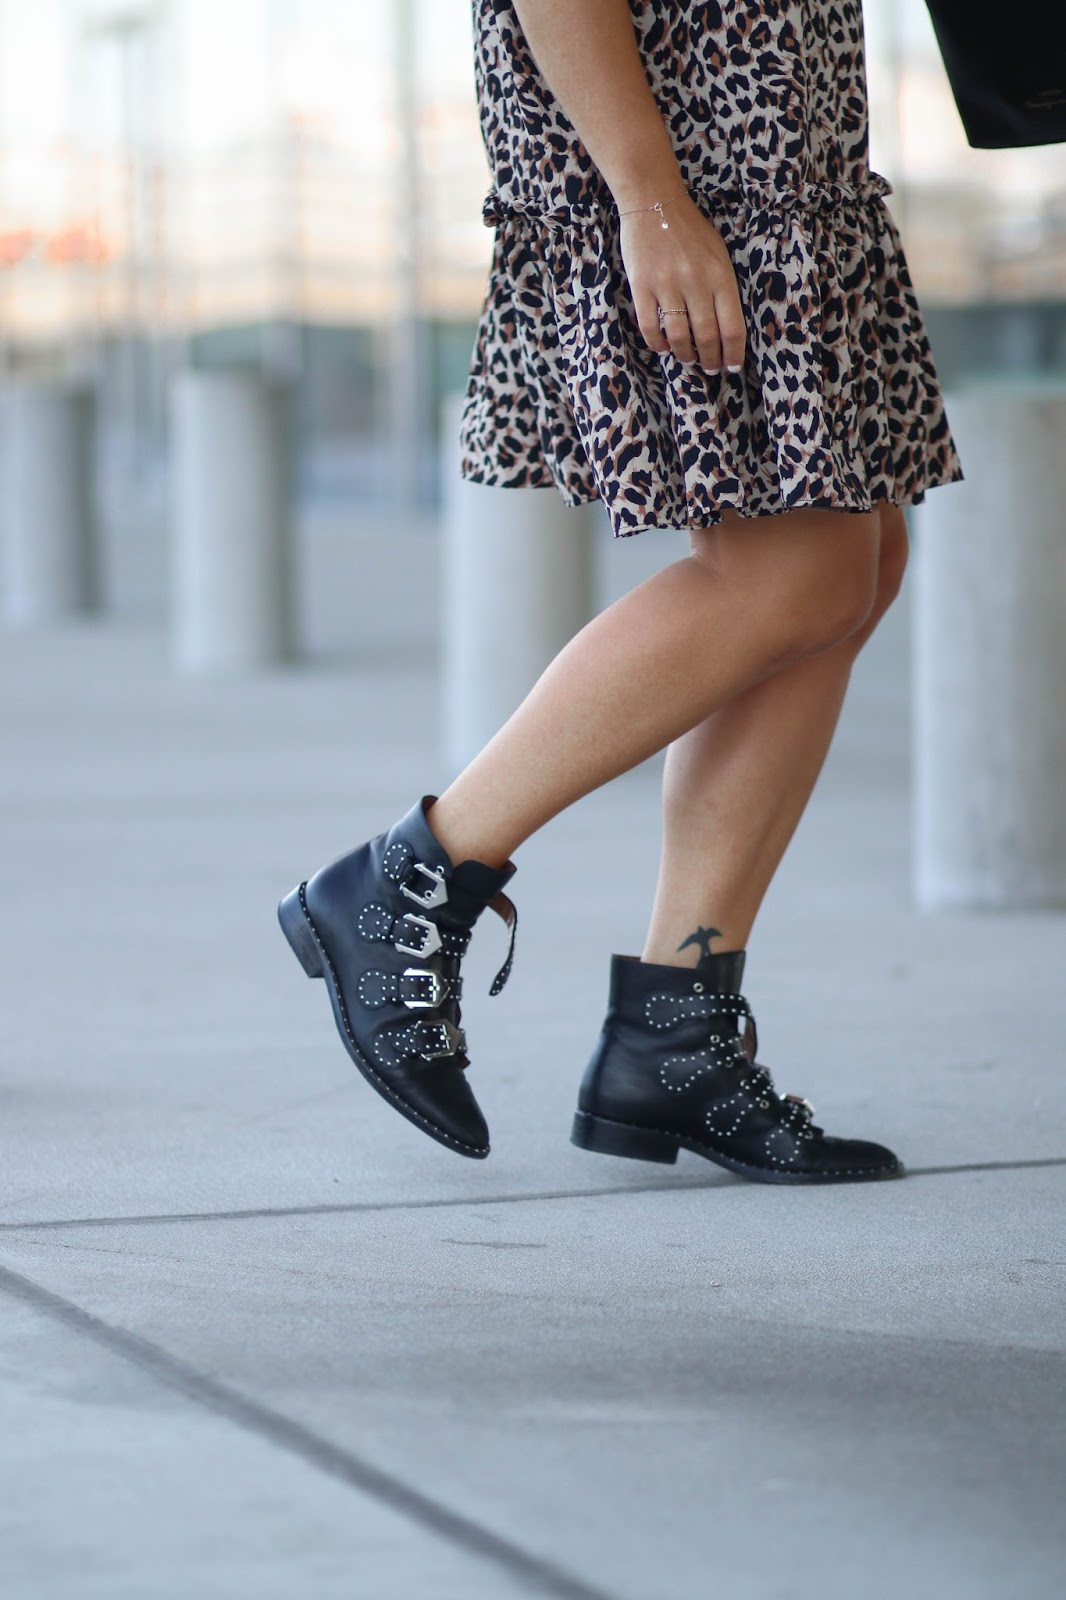 boots givenchy parisgrenoble